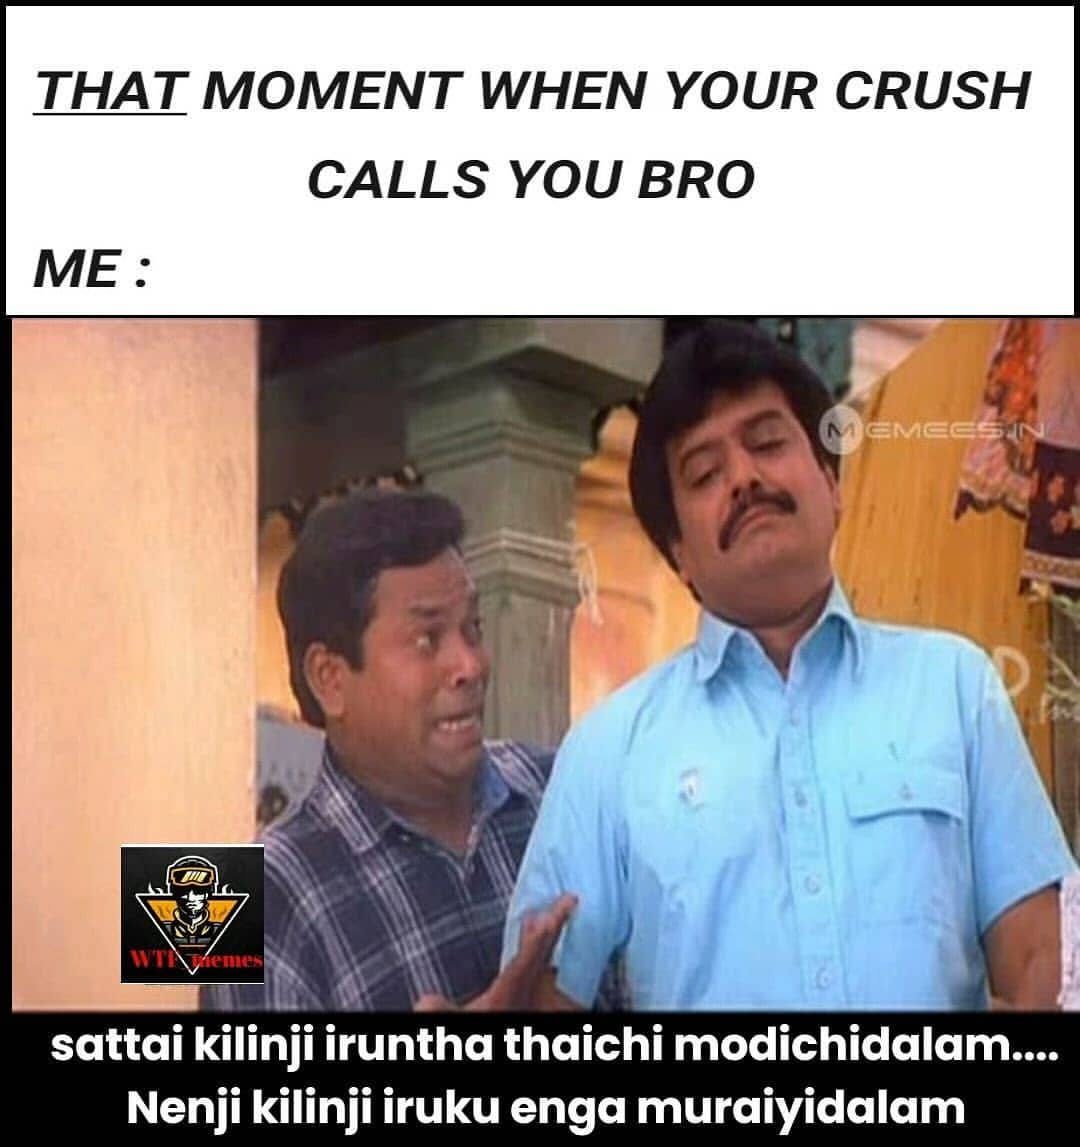 You calls when bro she When she